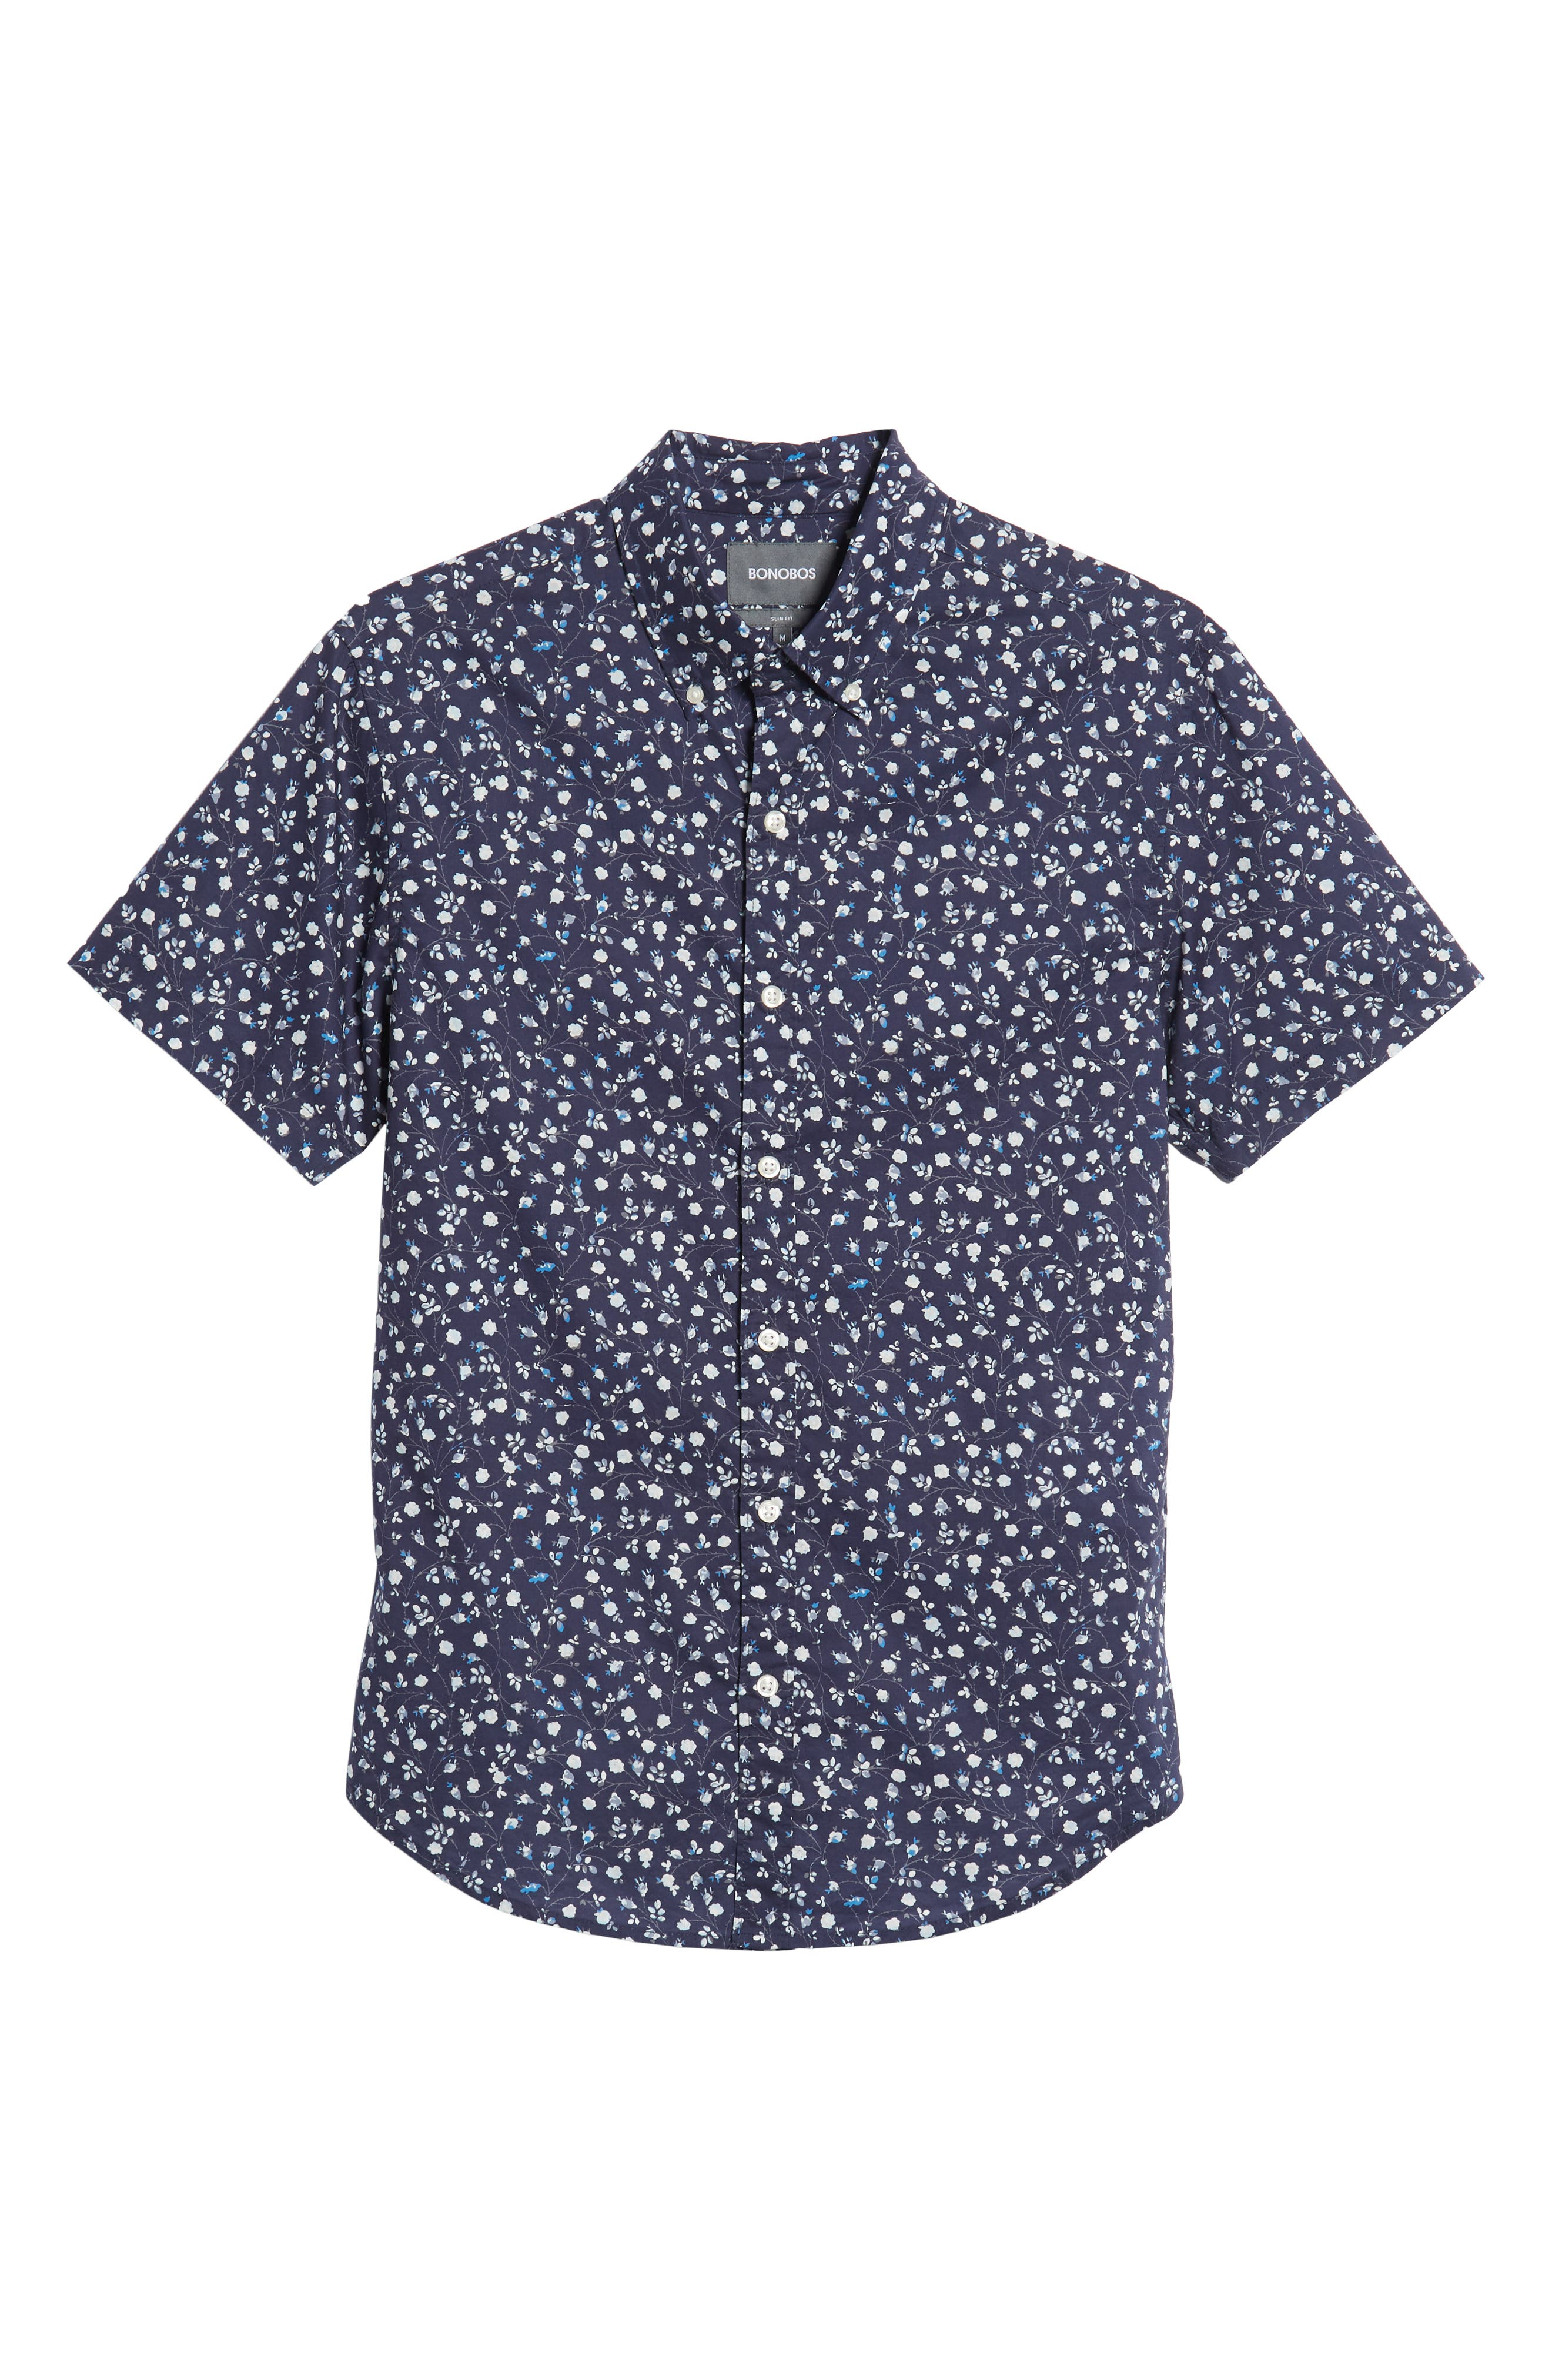 BONOBOS, Riviera Slim Fit Floral Print Sport Shirt, Alternate thumbnail 5, color, BLUE FLORAL